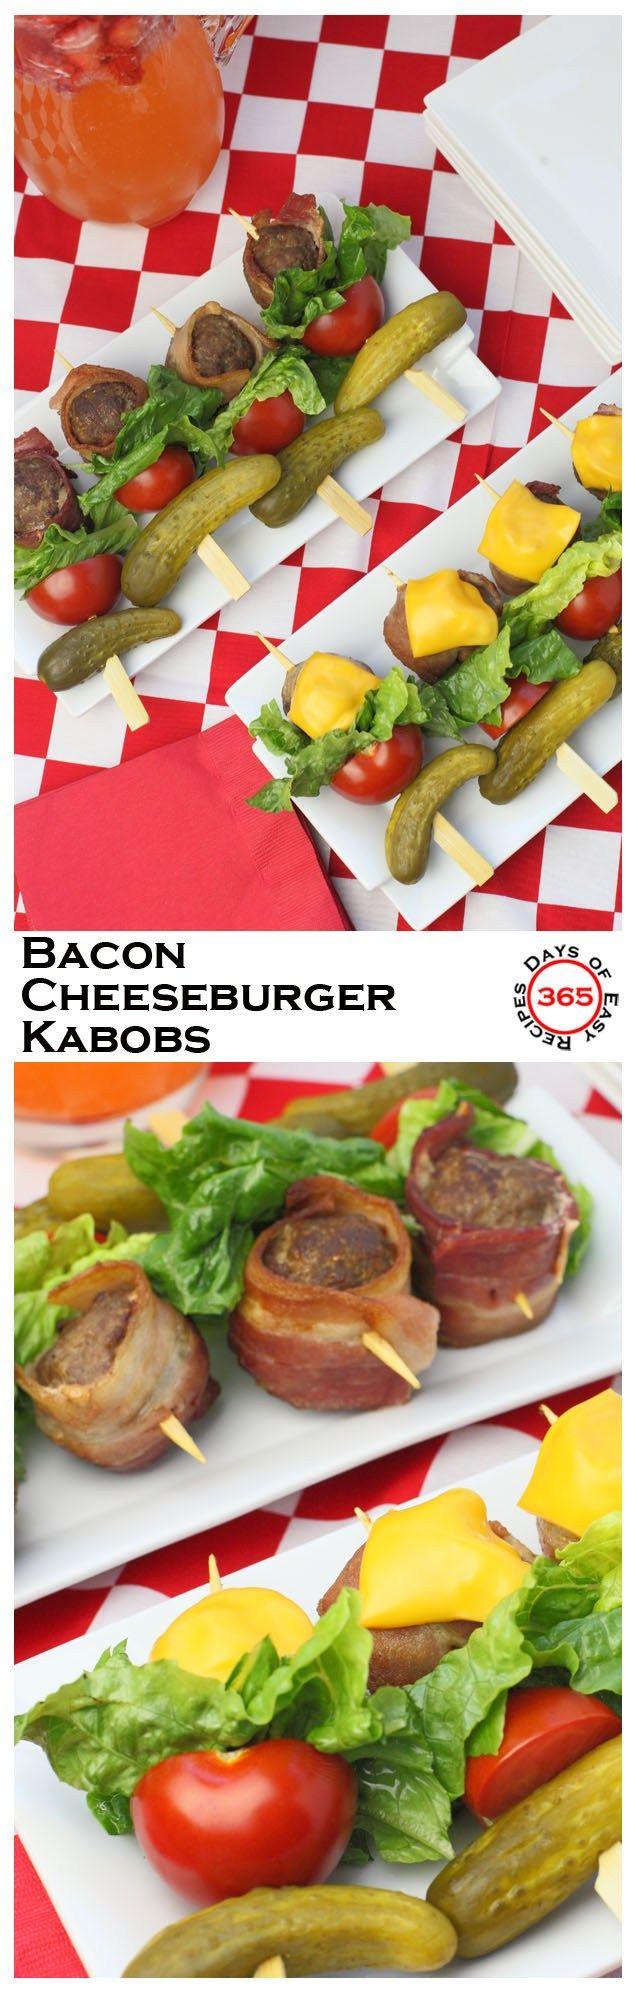 bacon cheeseburger kabobs   bbq & grill : beilagen   pinterest